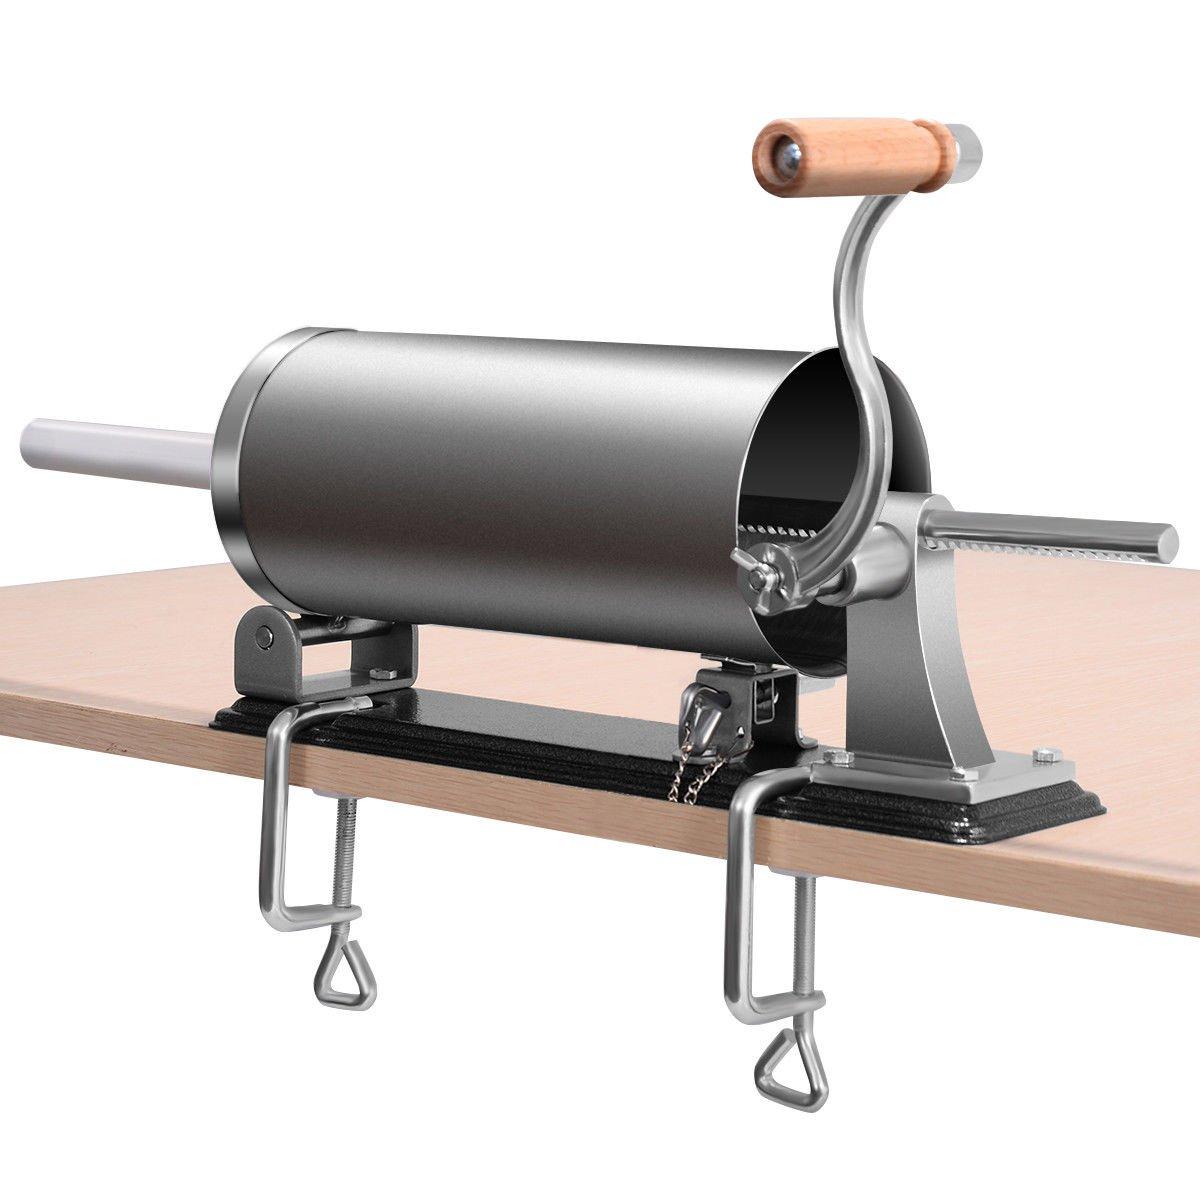 GHP Home/Industrial Stainless Steel & Aluminum 4.8L Horizontal Sausage Stuffer Maker